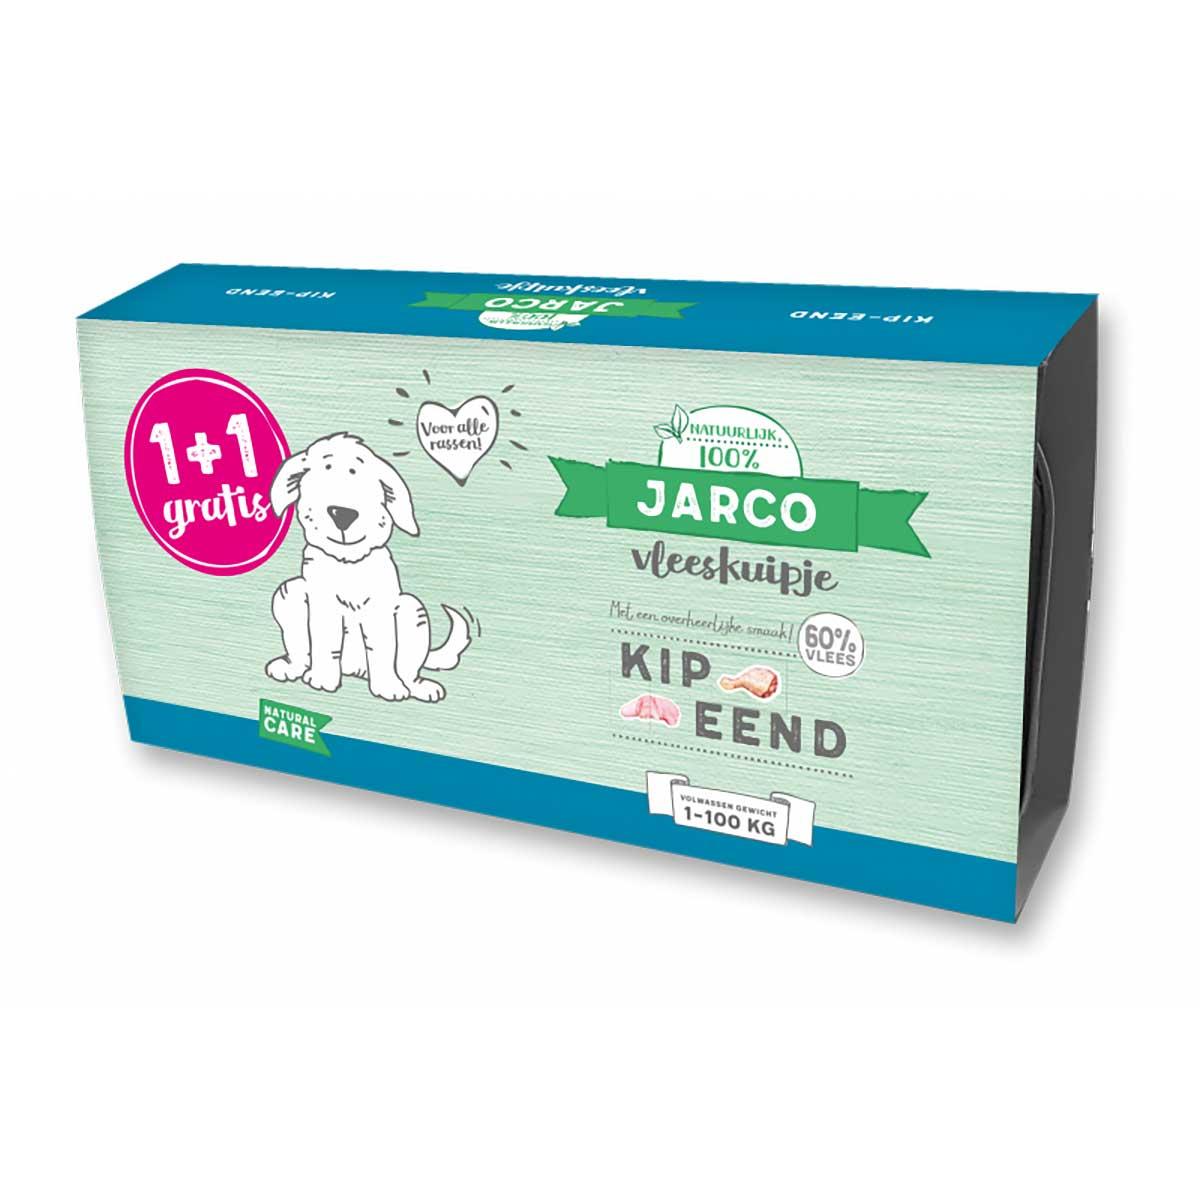 Jarco dog alu kip-eend (2-pack) 2 x 150g